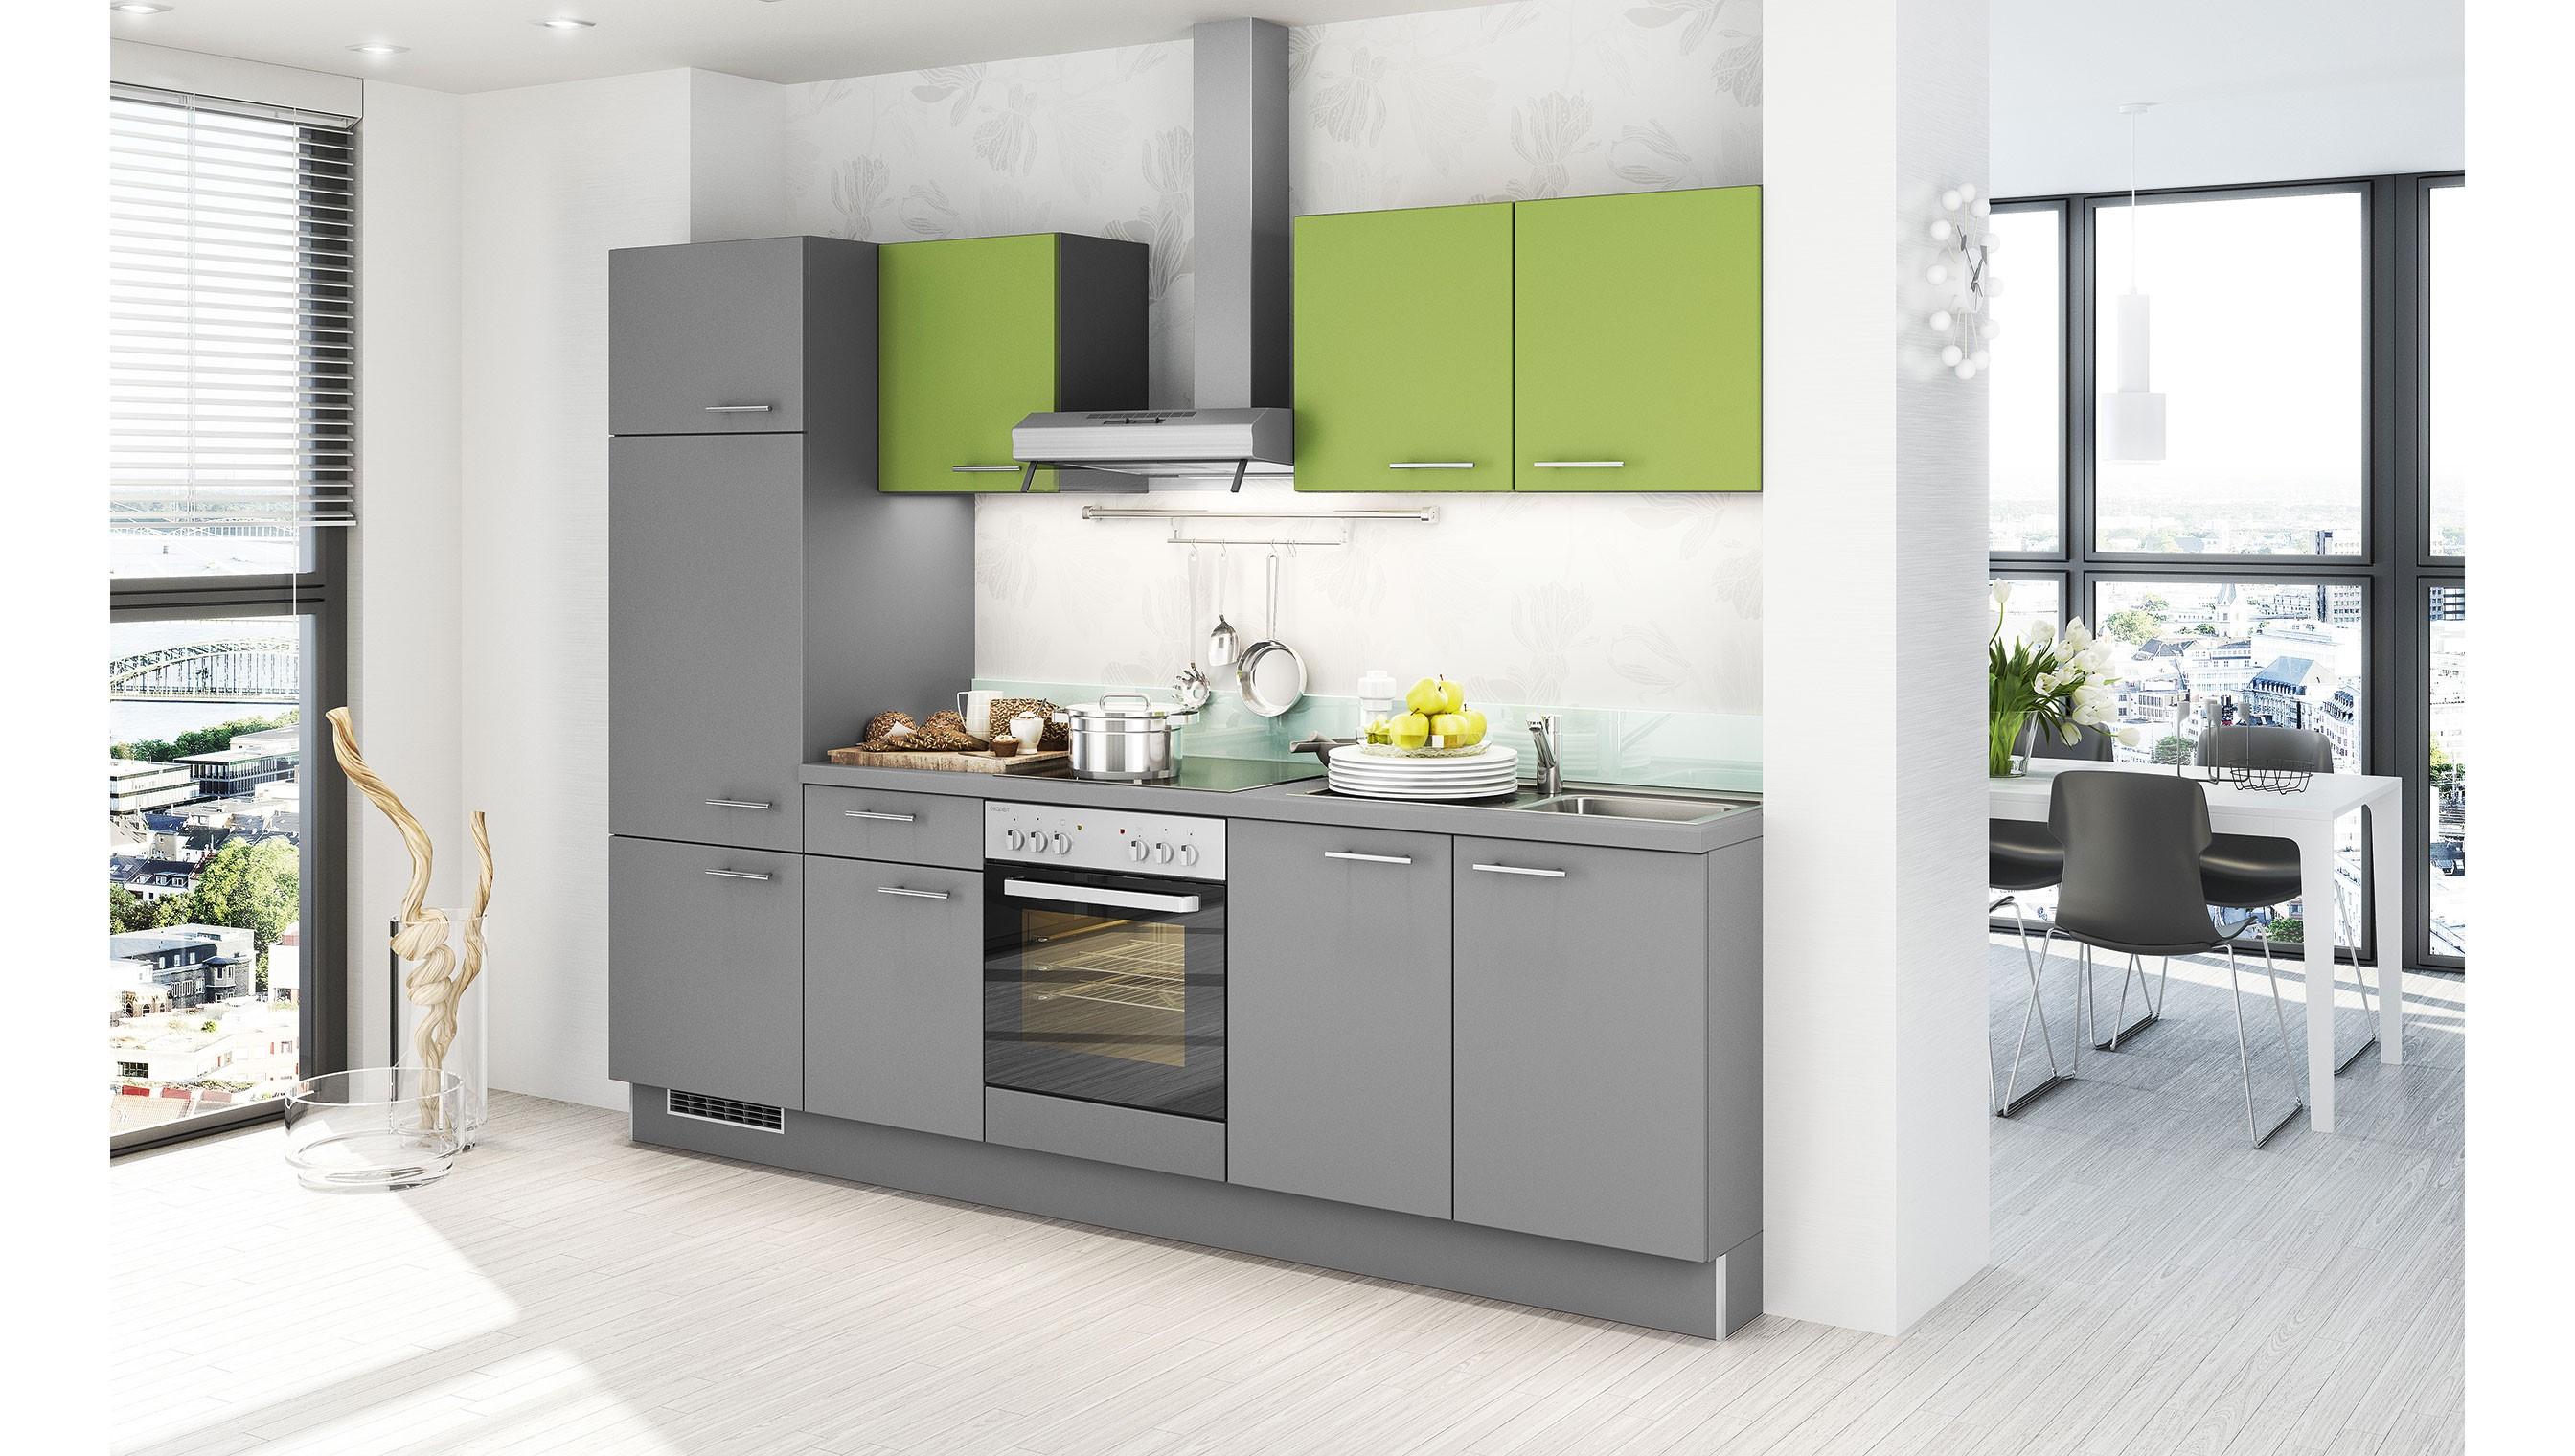 k chenblock spilger s sparmaxx. Black Bedroom Furniture Sets. Home Design Ideas